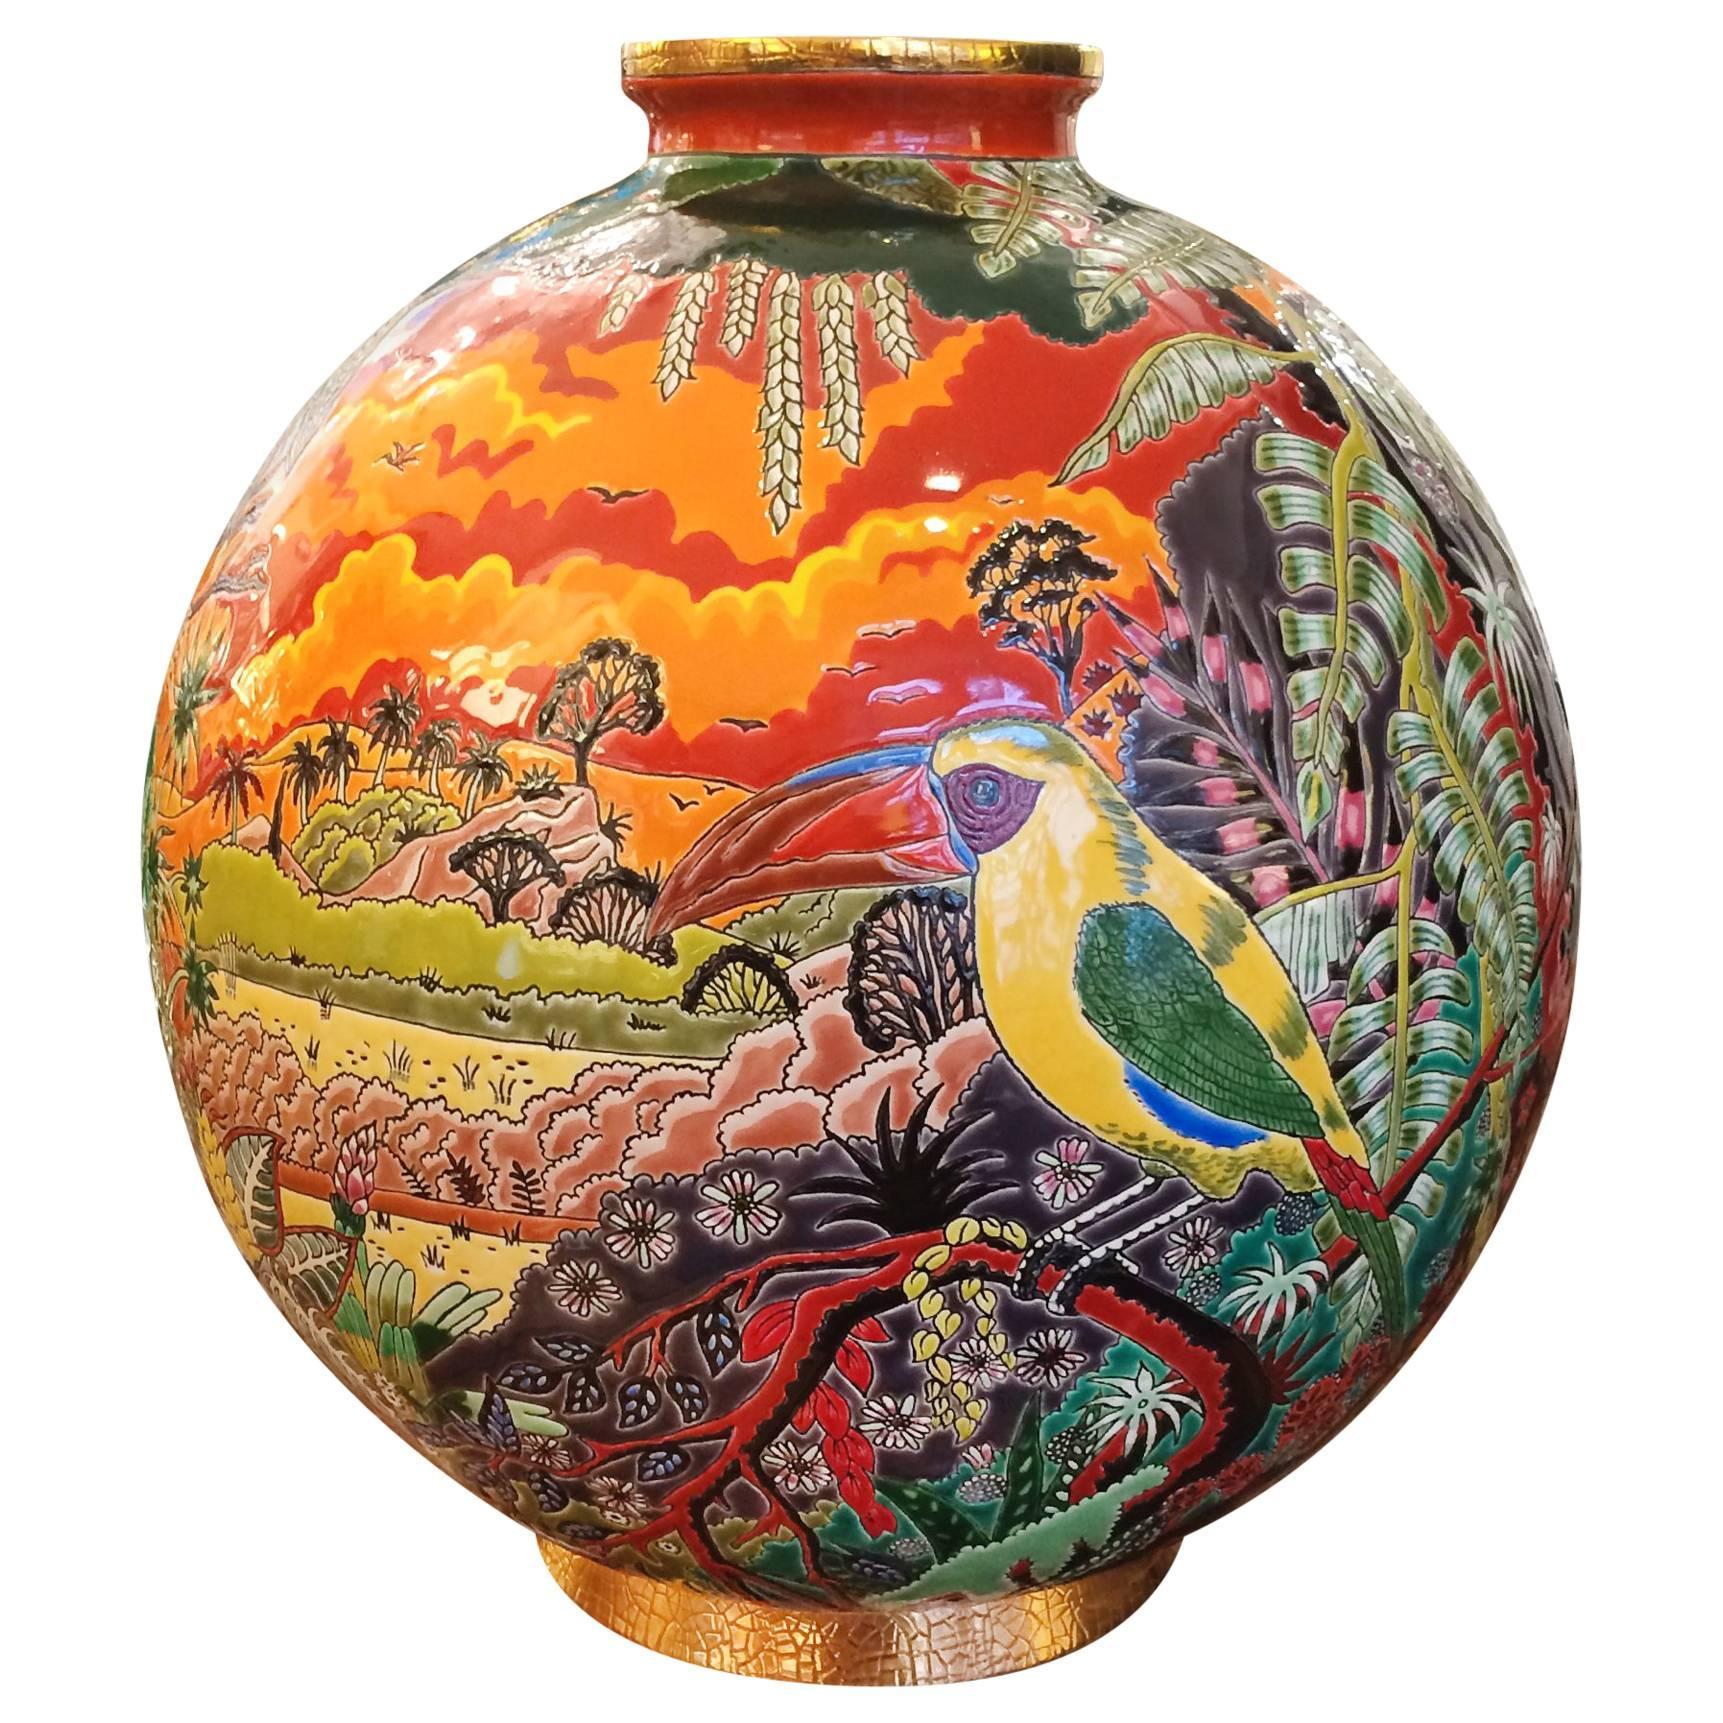 Toucan Vase Emaux de Longwy Limited Edition